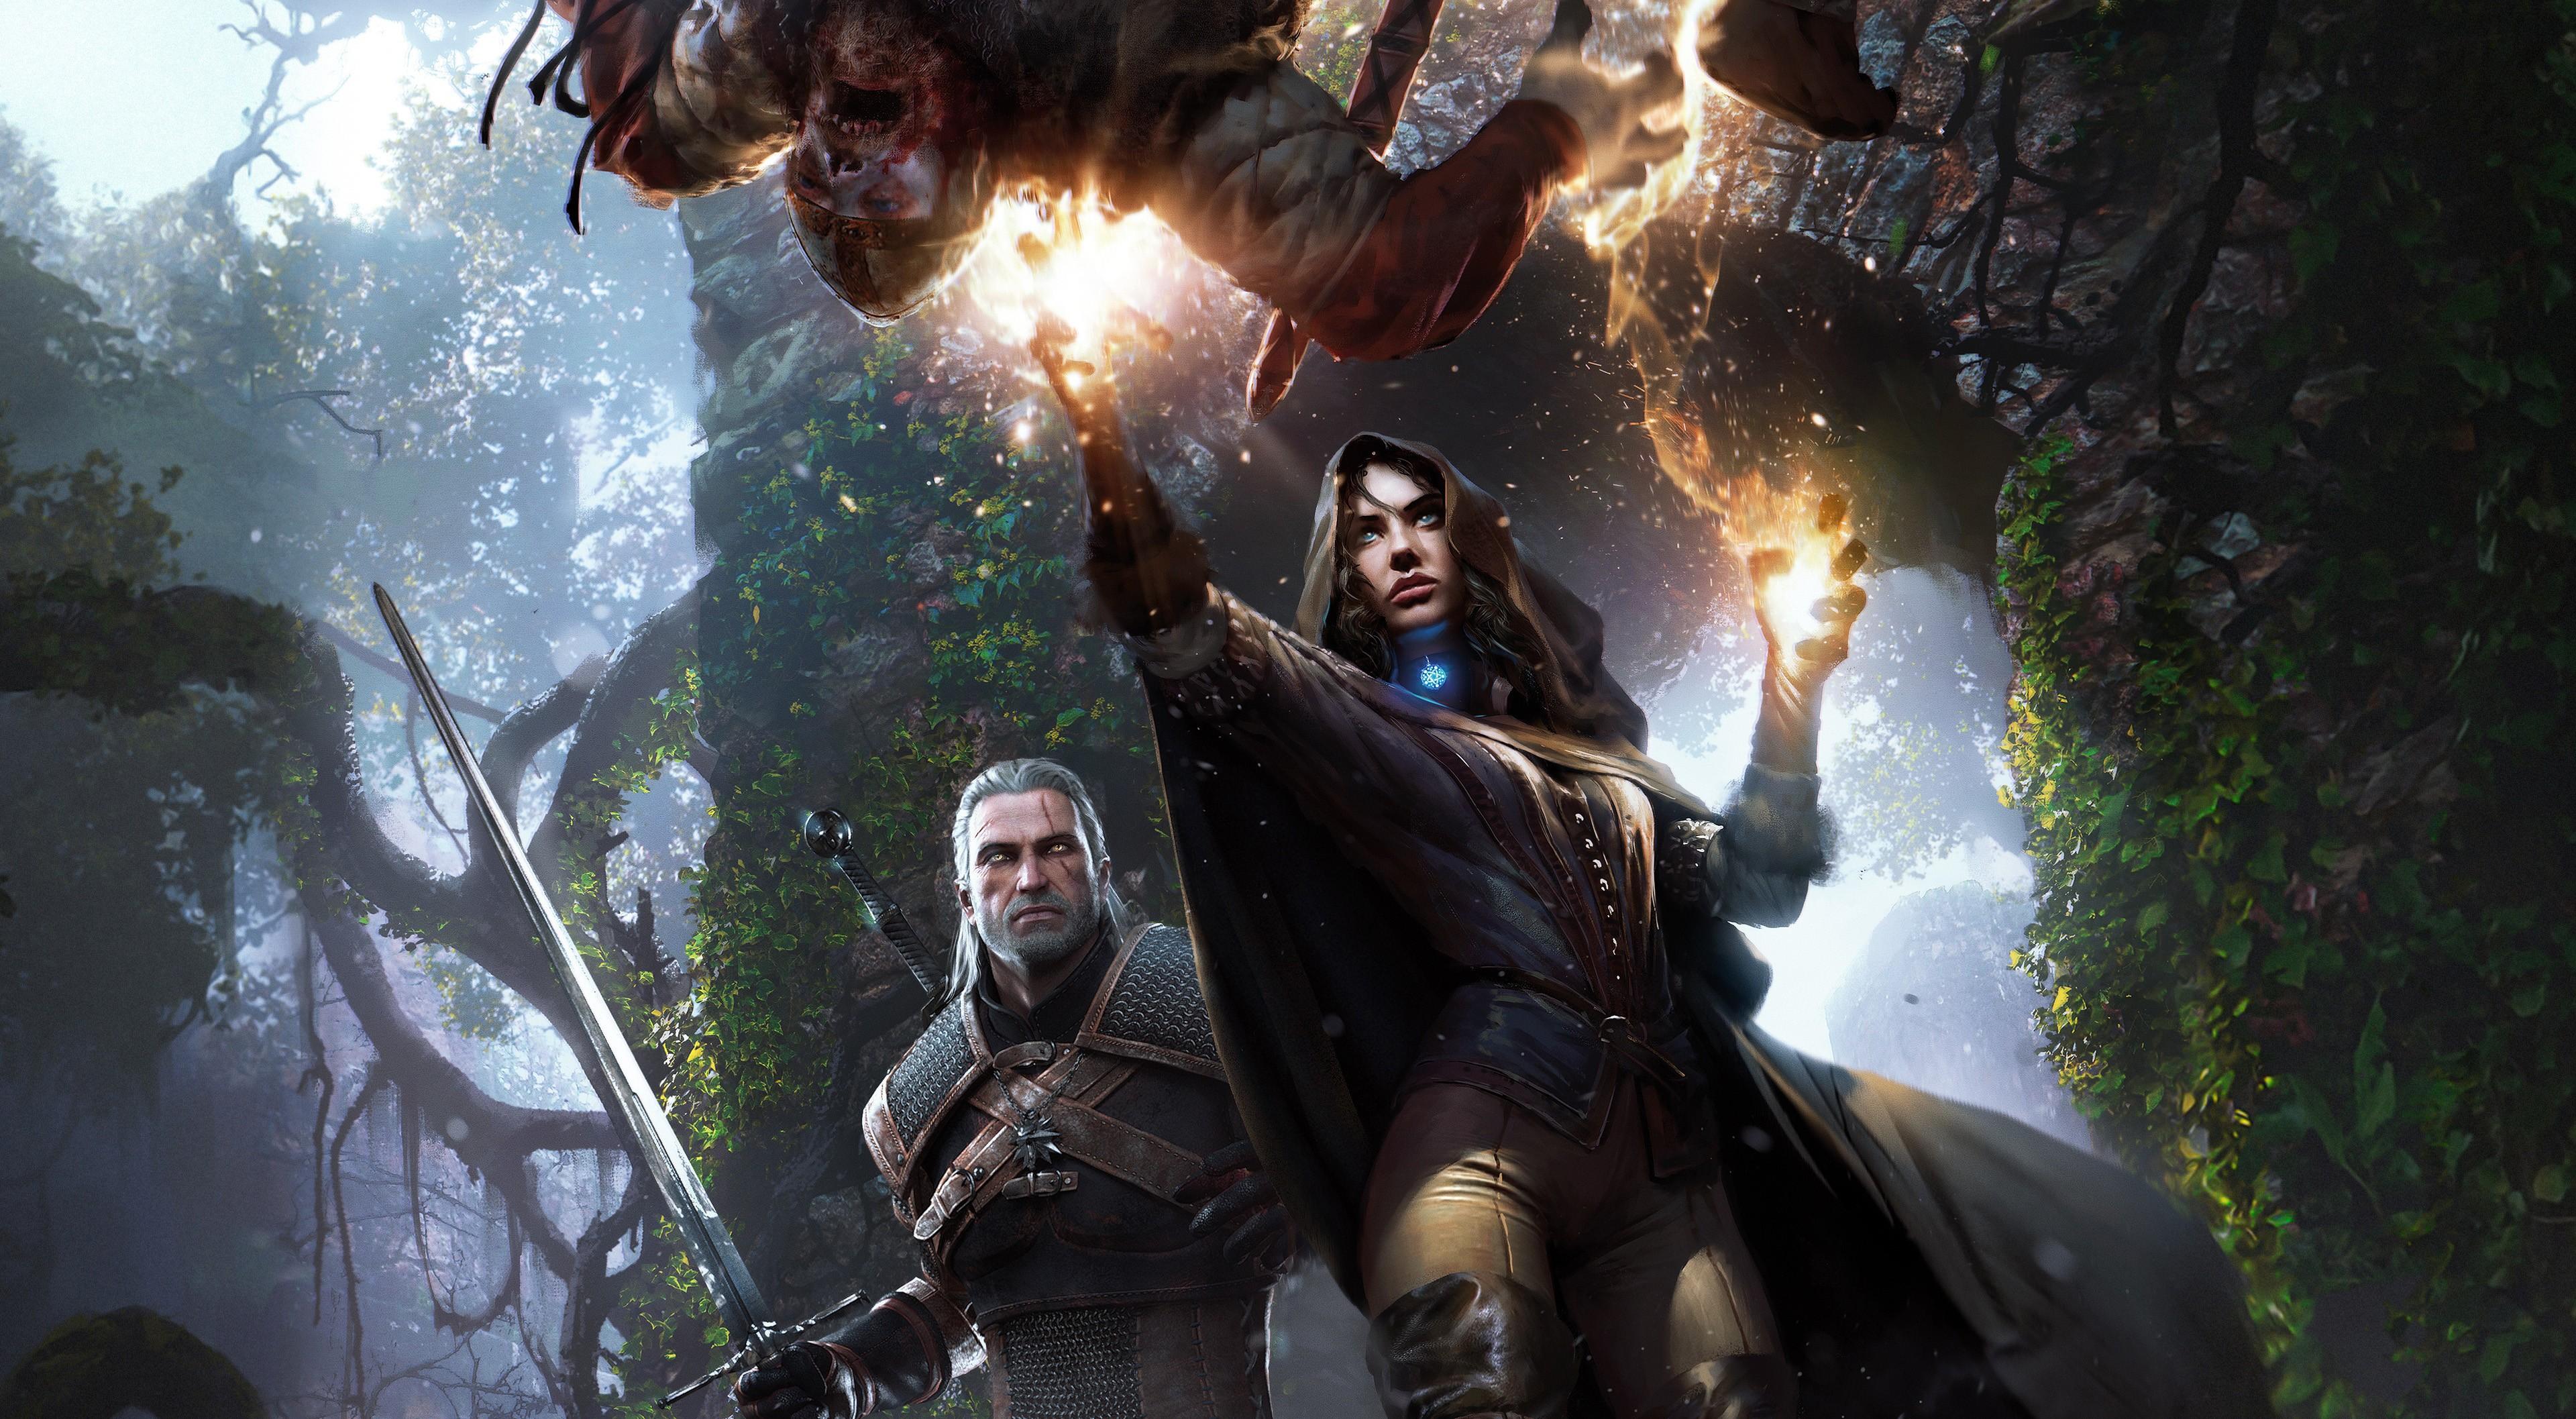 Fondos De Pantalla La Caza Salvaje De Witcher 3 Geralt De